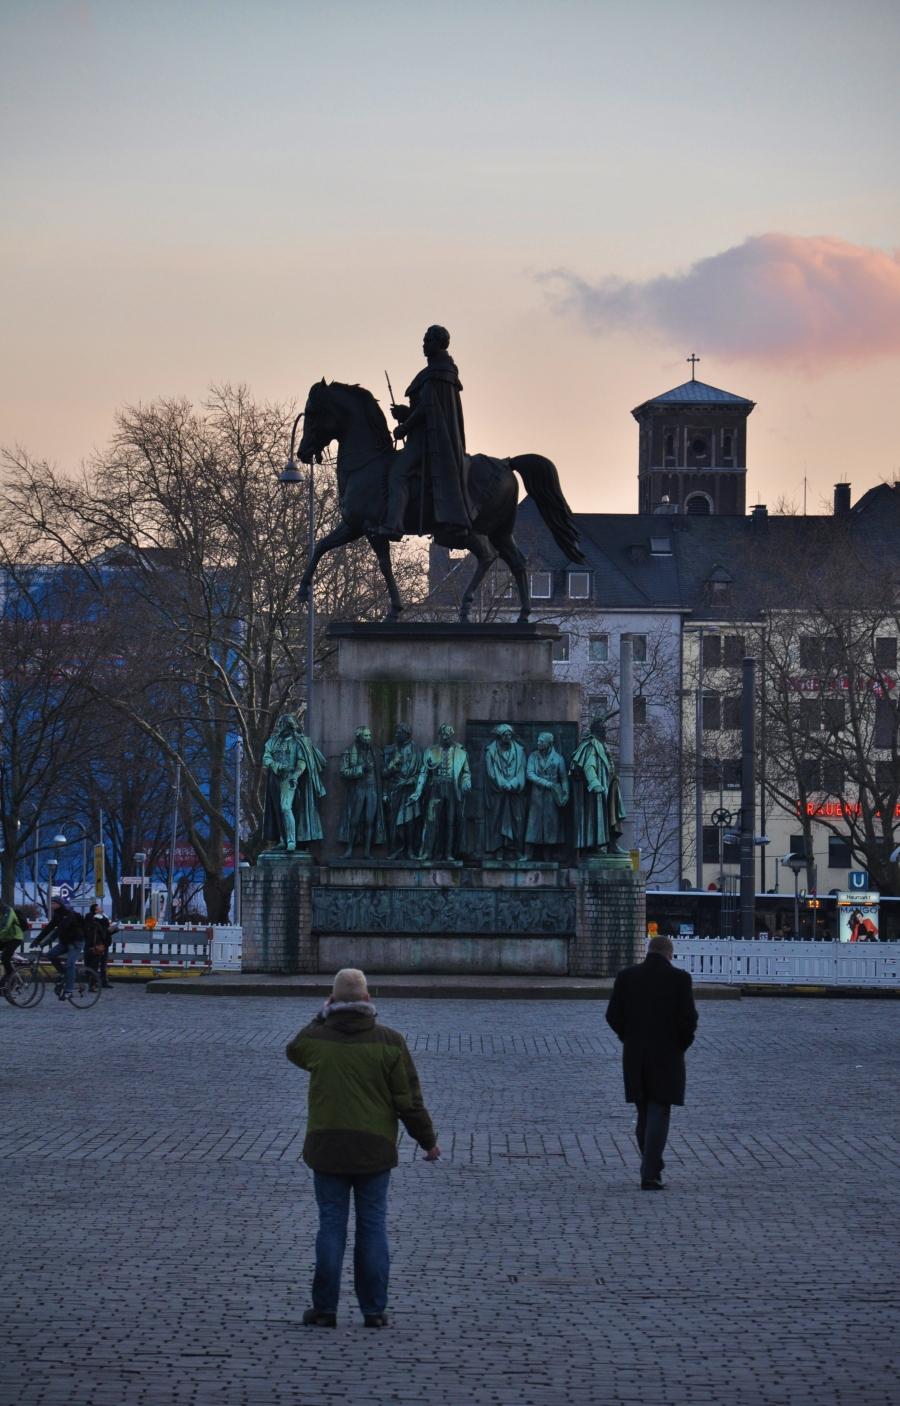 Cologne and the Kolner Dom